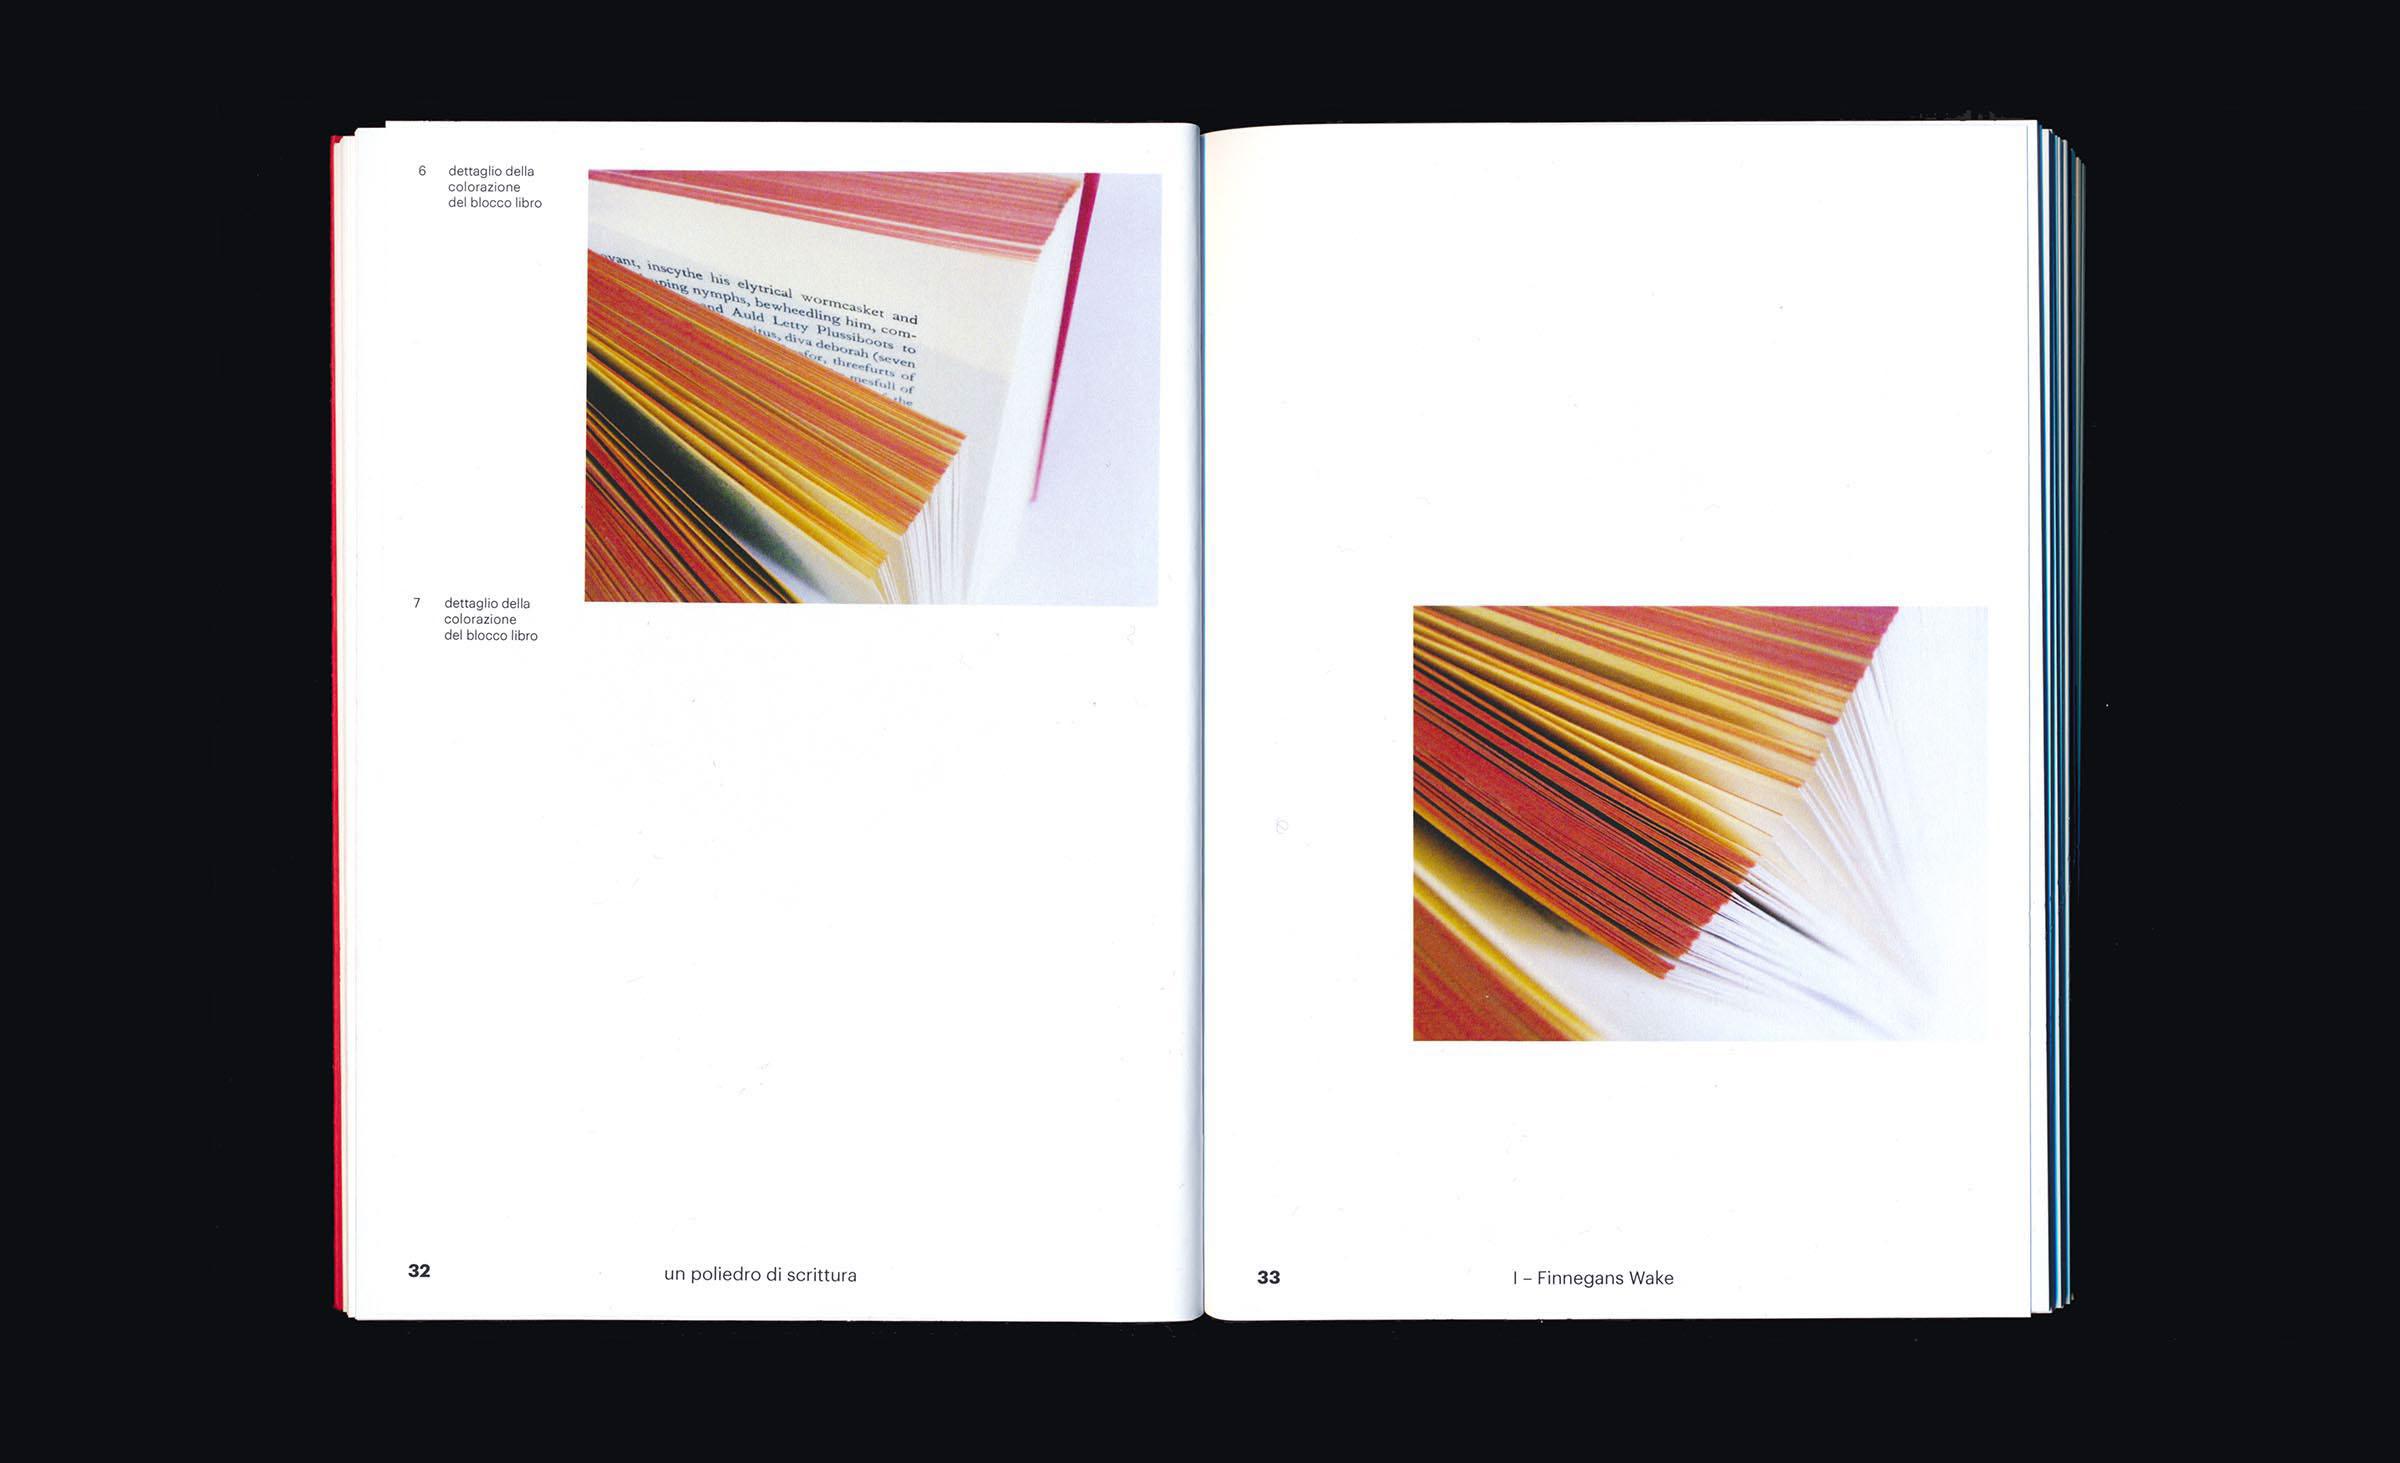 Un poliedro di scrittura — Bibliogramma on Behance